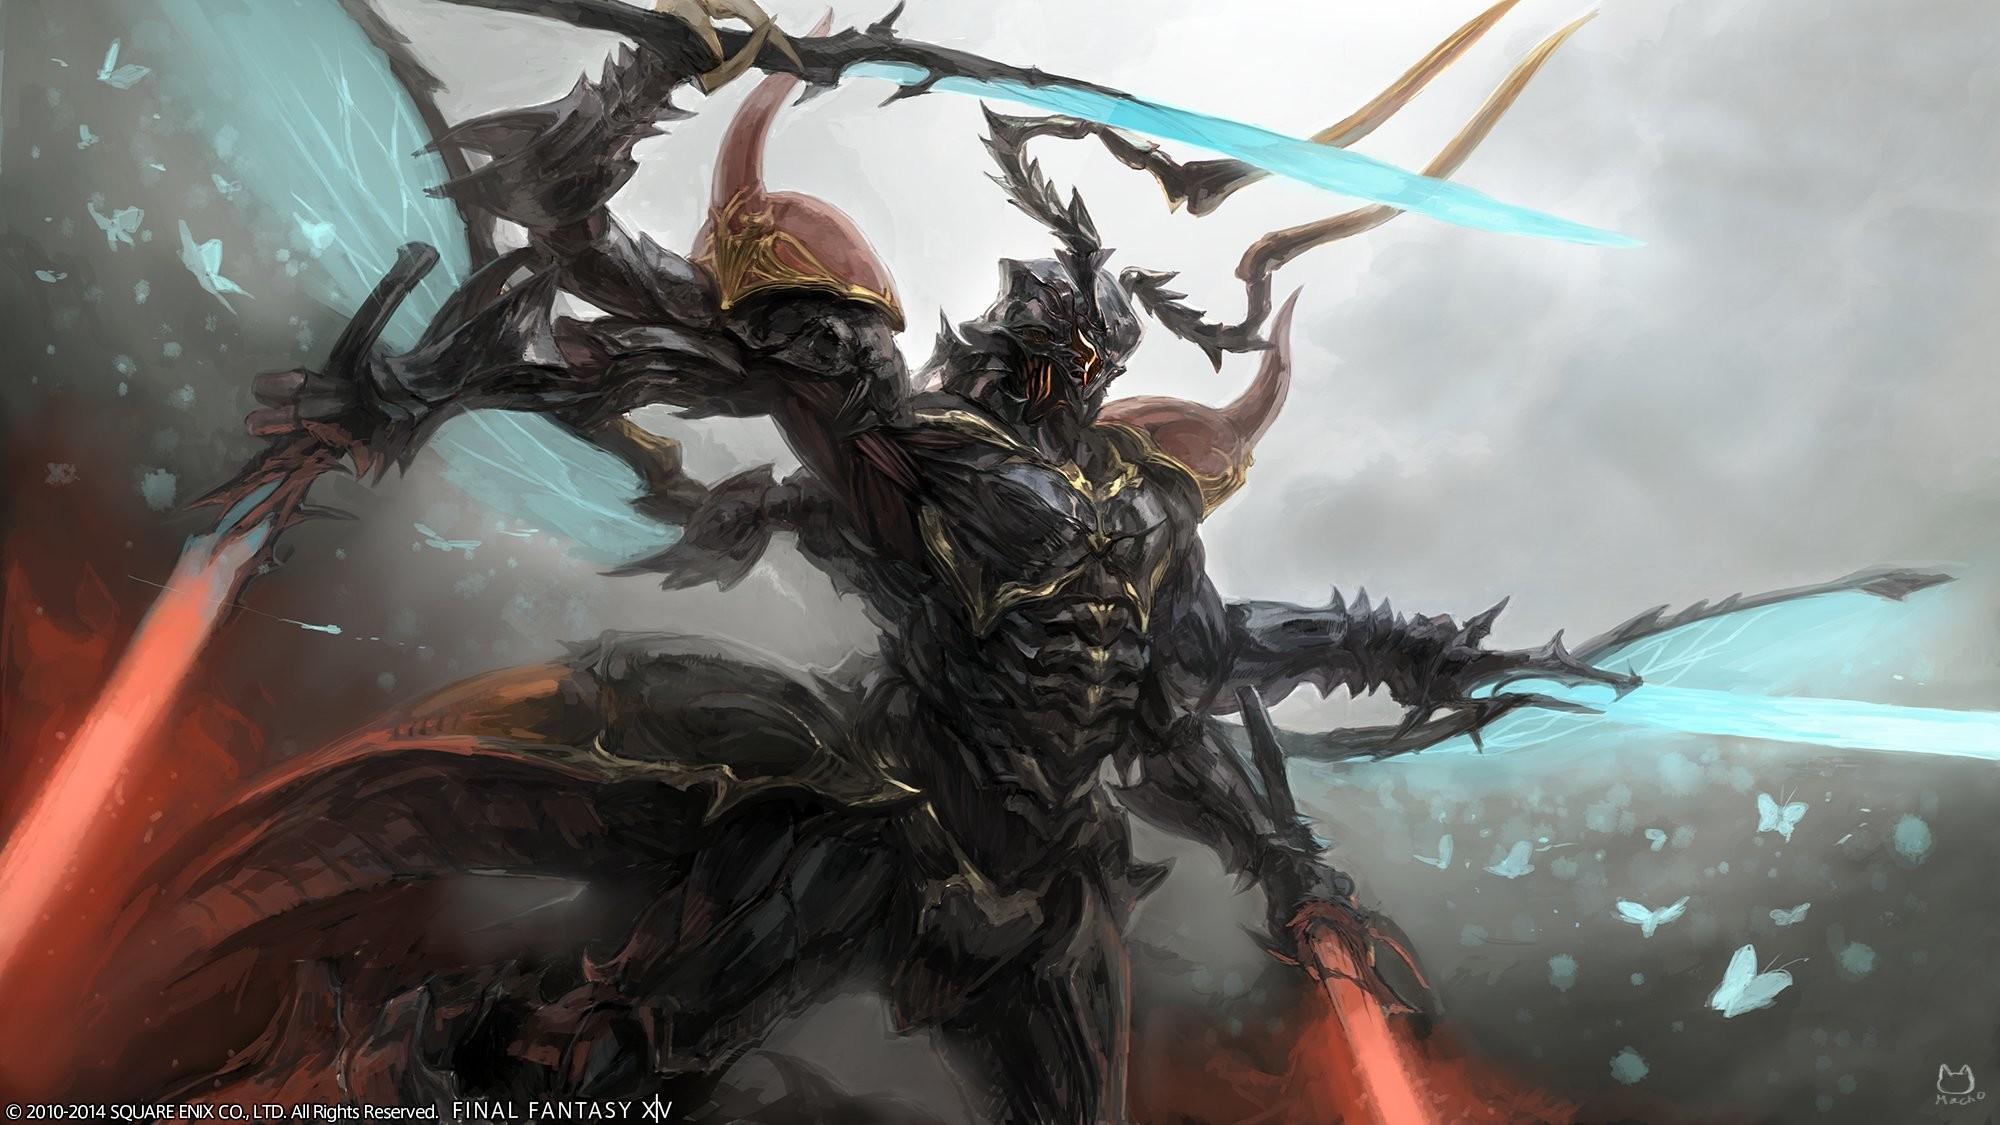 22 Dec Final Fantasy XIV Heavensward Expansion Adds 2 New Jobs